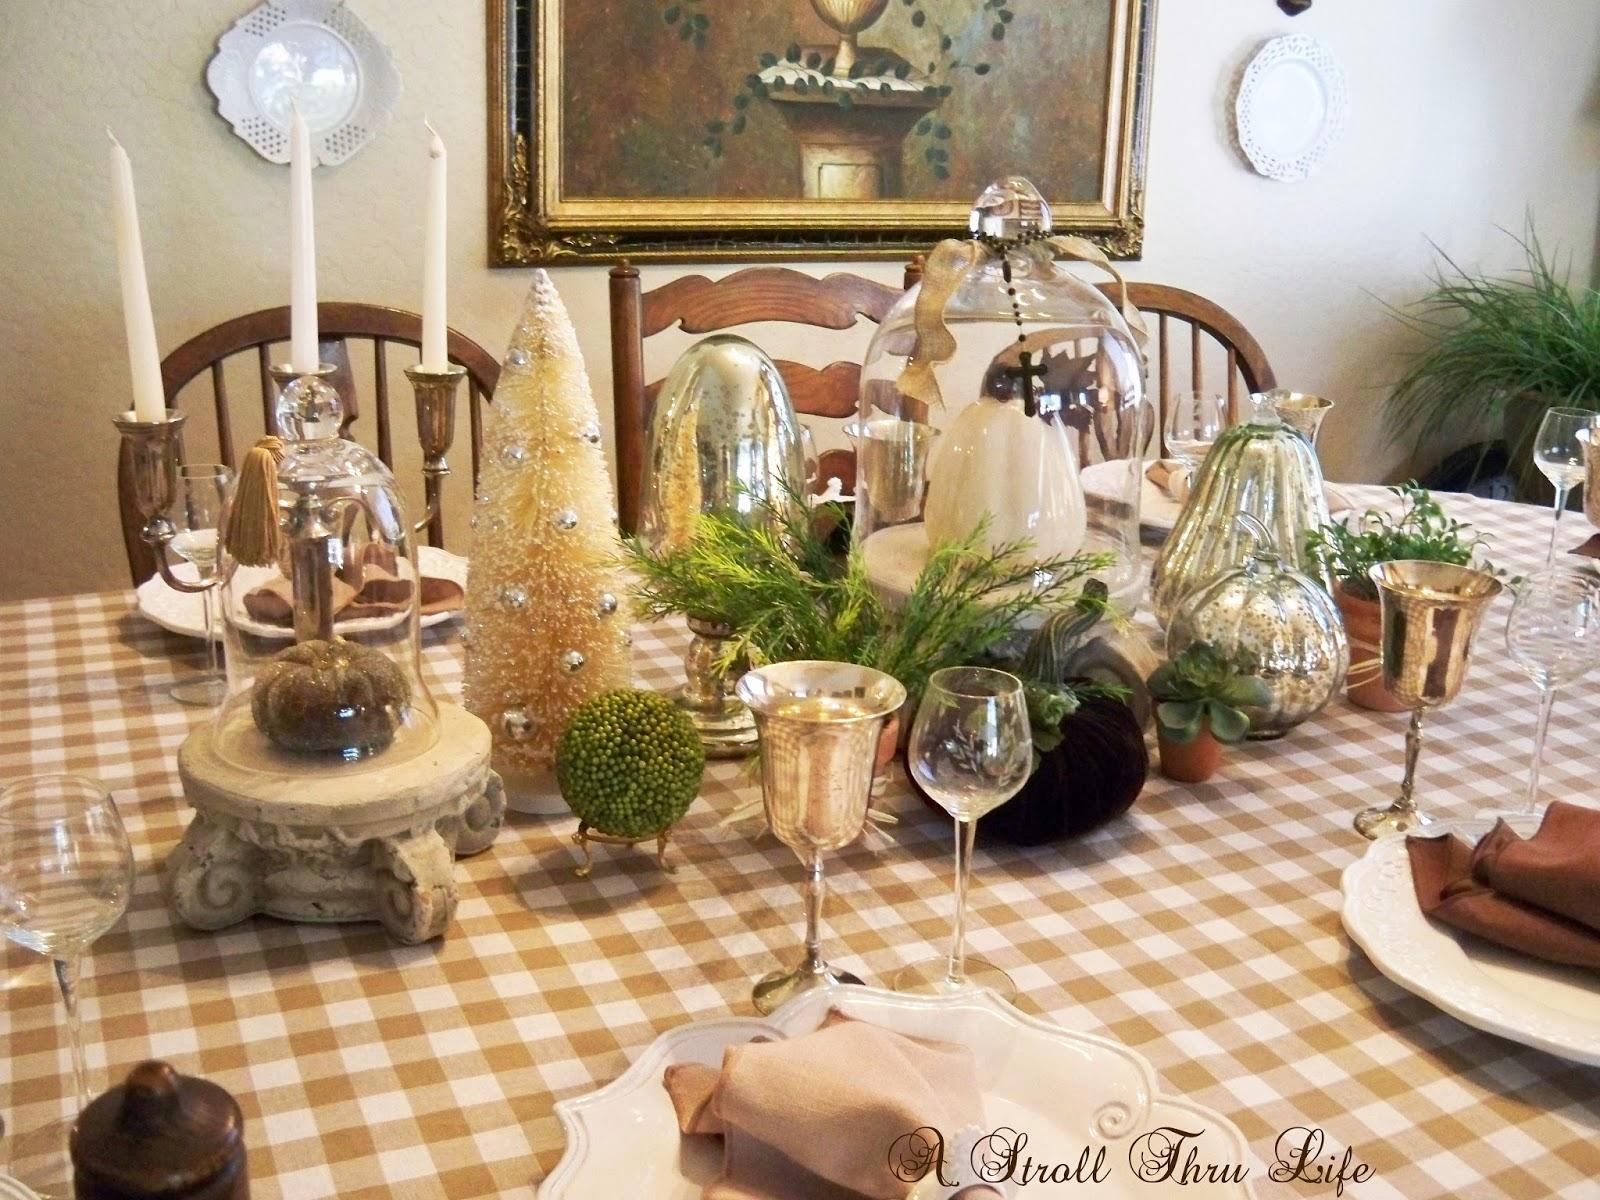 A Stroll Thru Life: My Thanksgiving Table